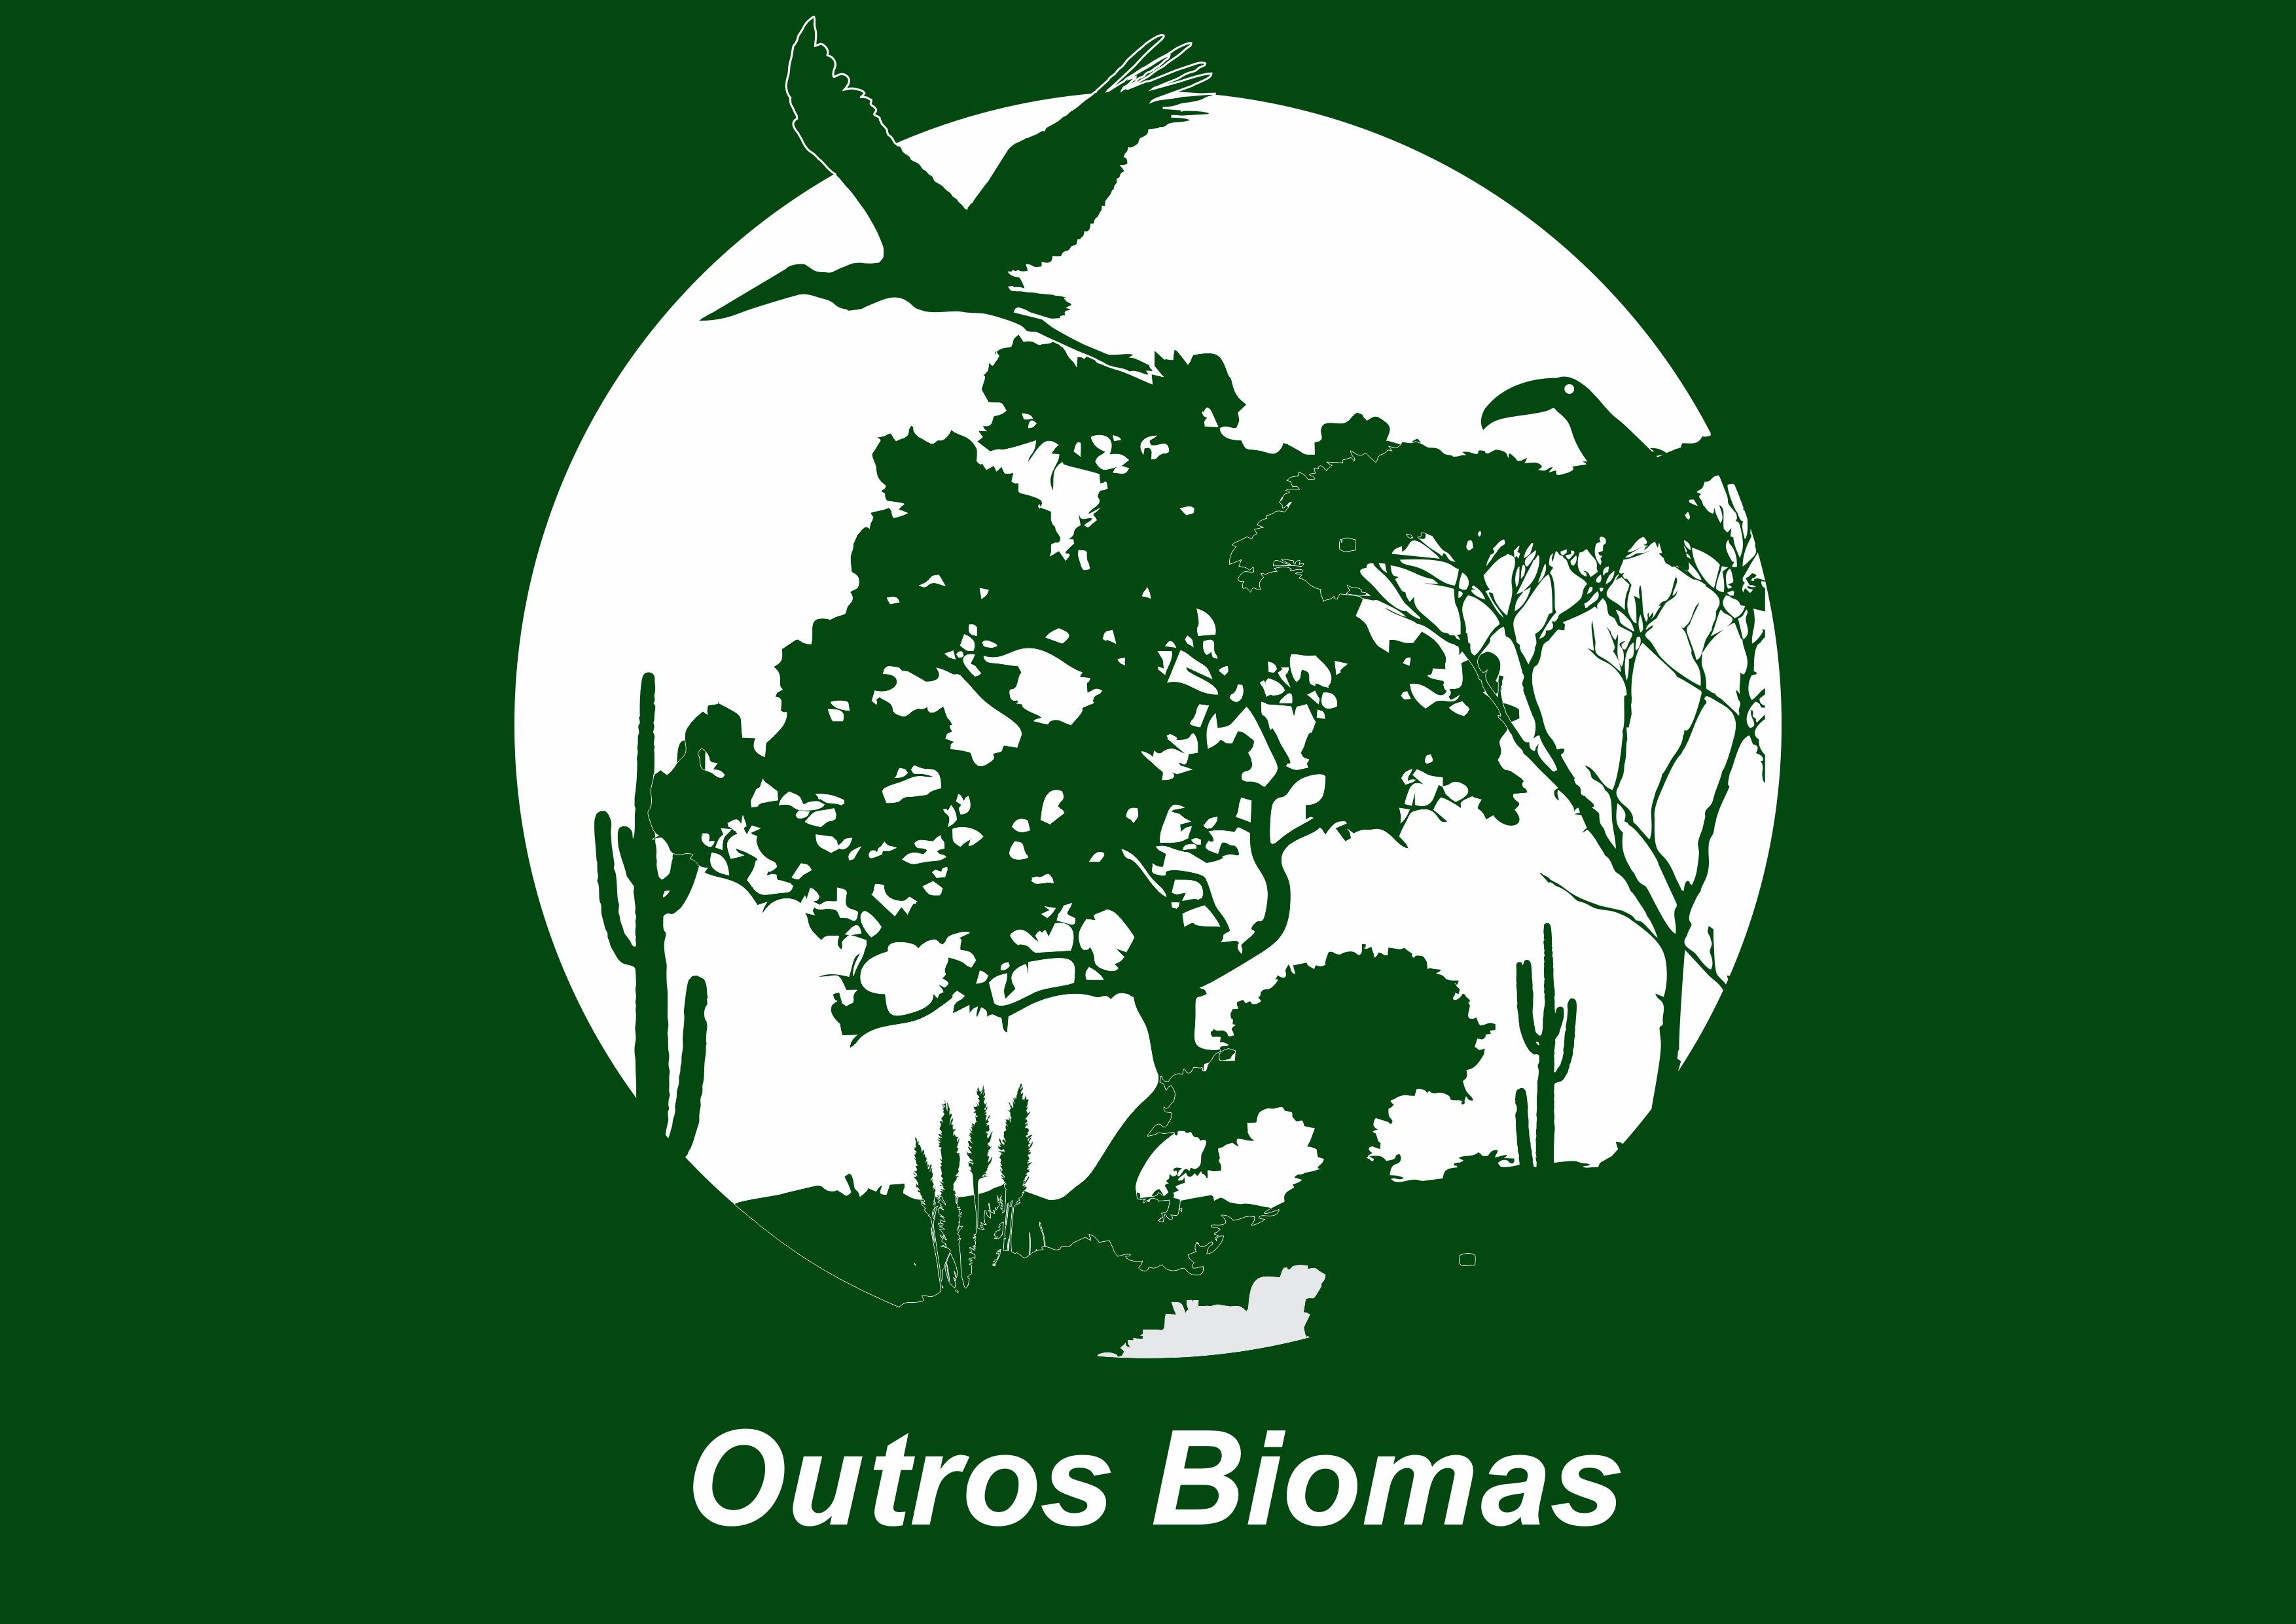 /OBT/assuntos/programas/outros-biomas